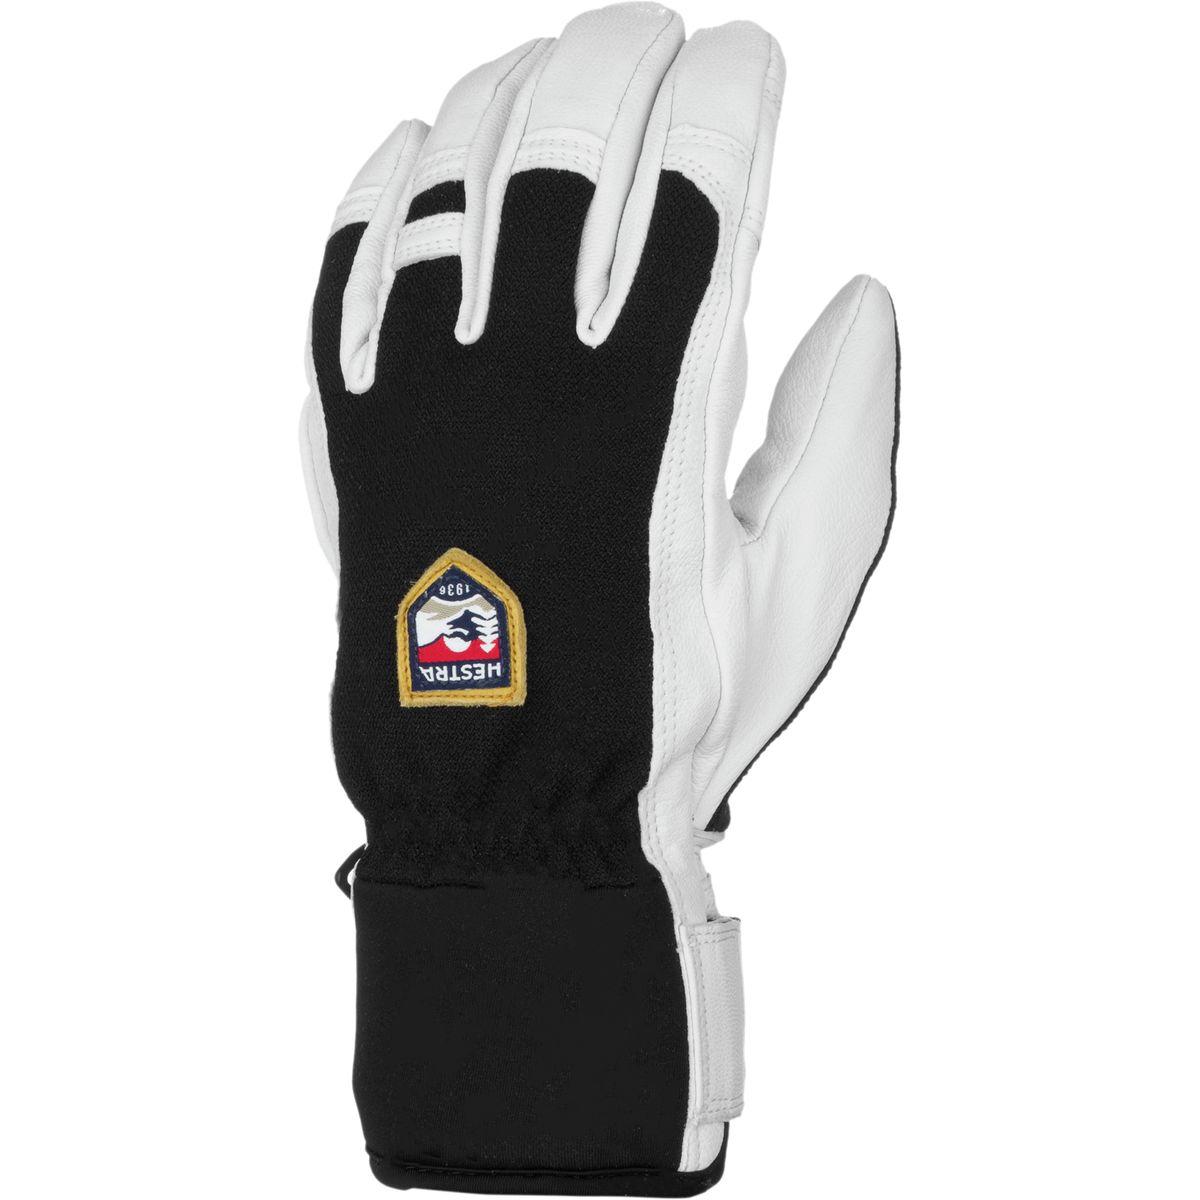 Hestra Army Leather Patrol Glove